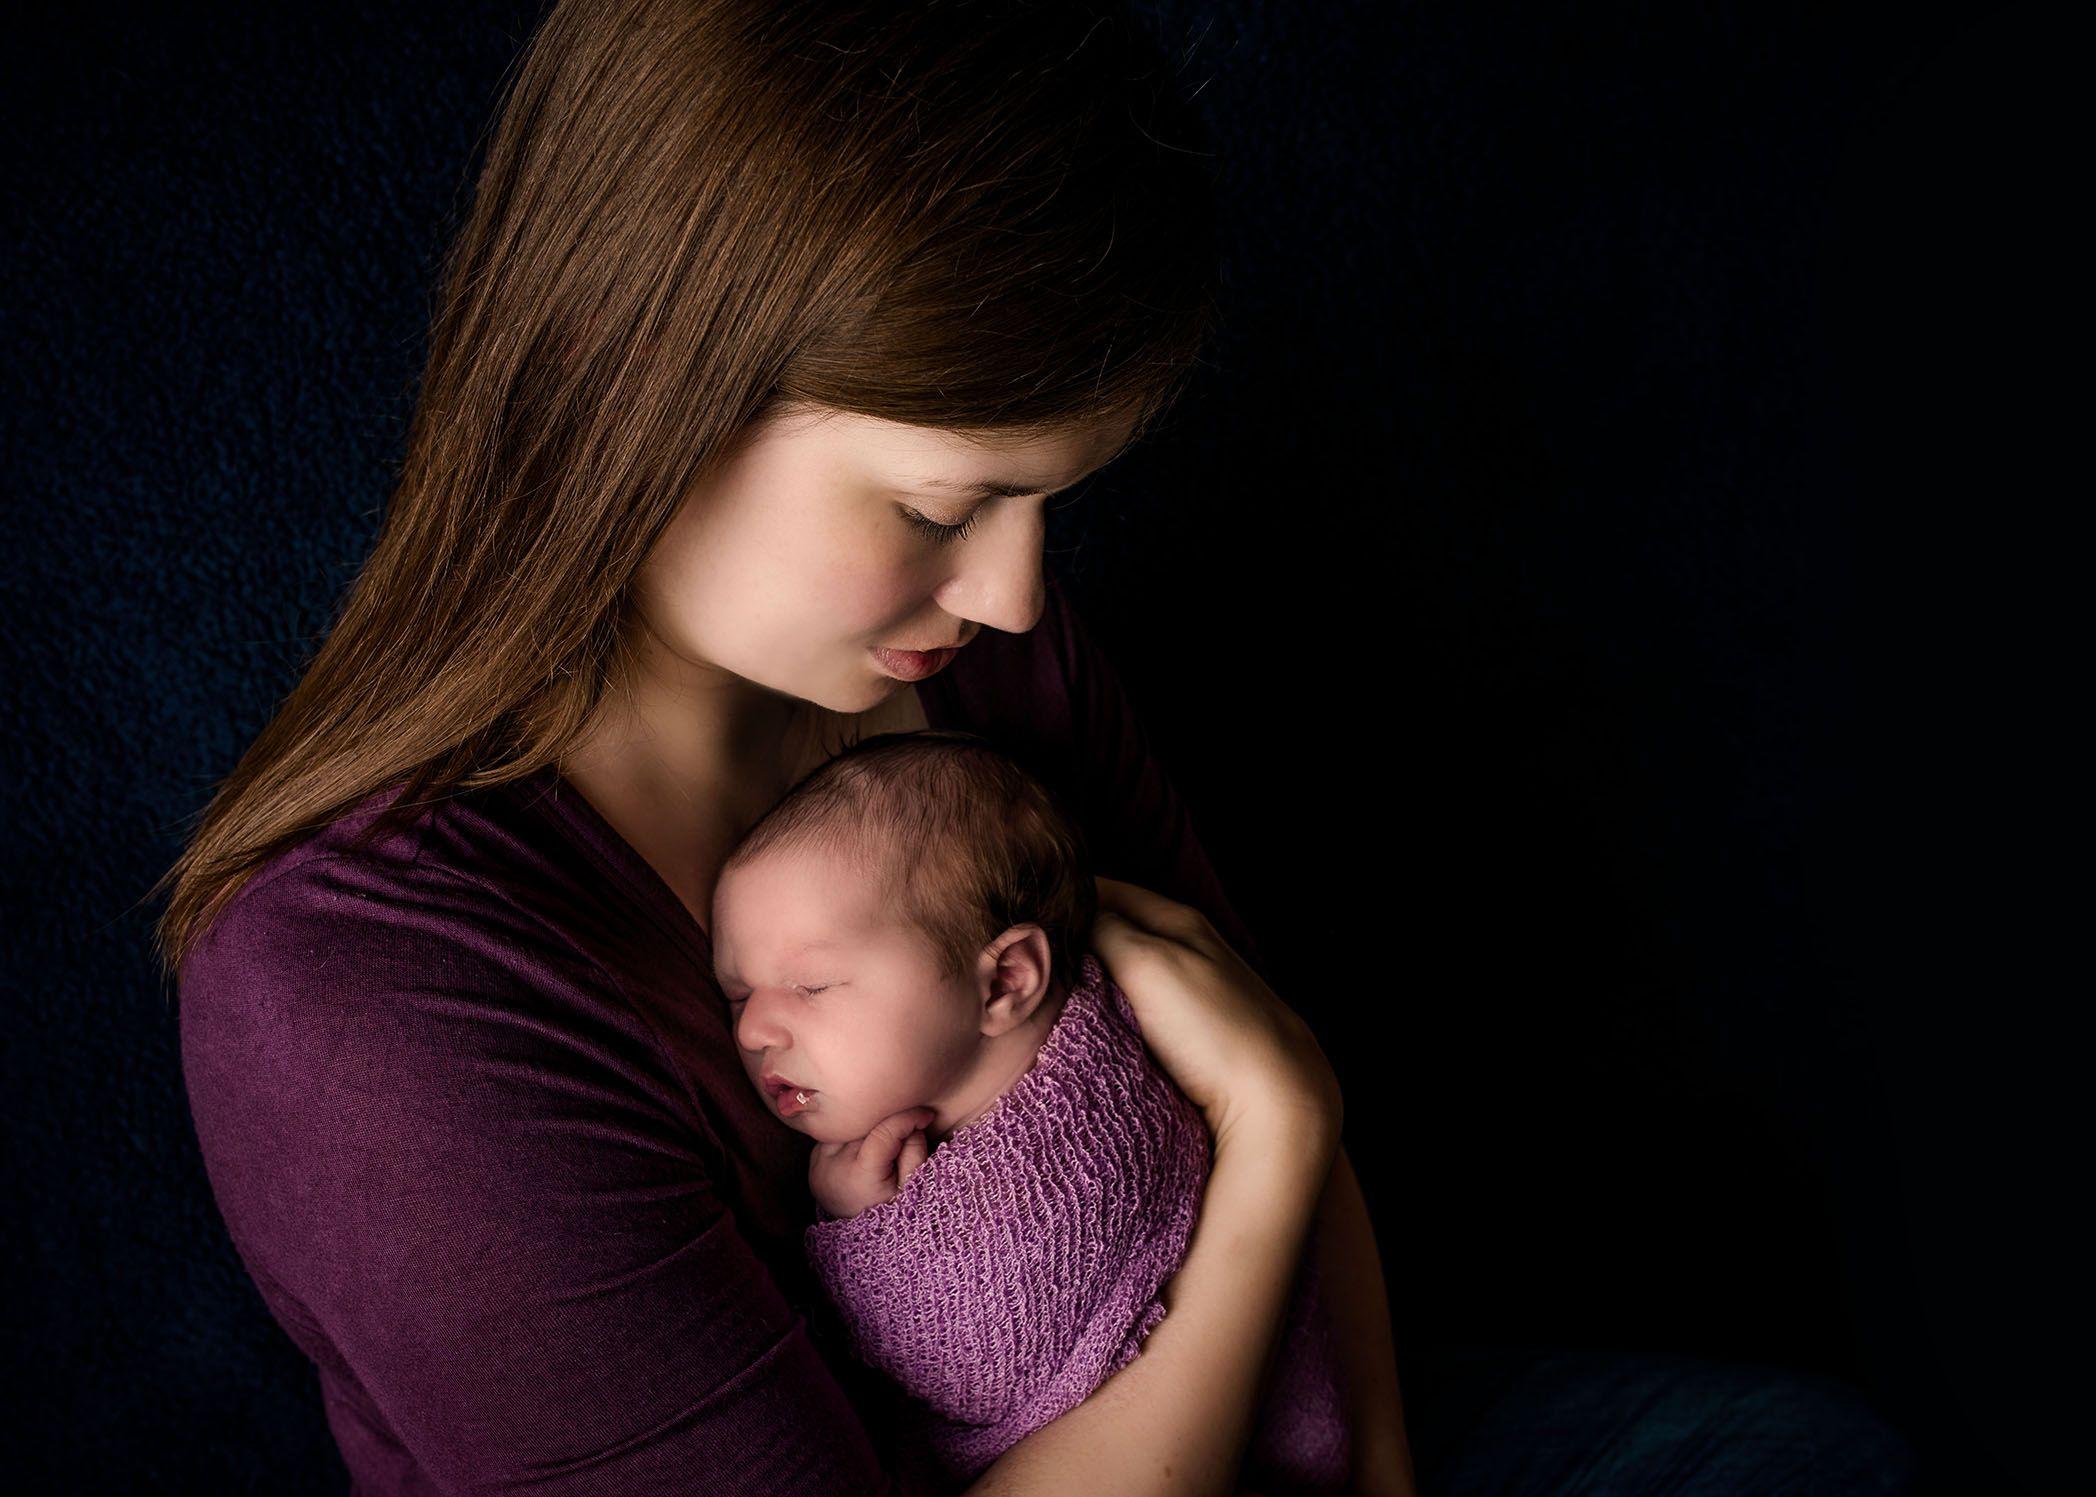 Mom holding newborn baby girl on her chest one big happy photo